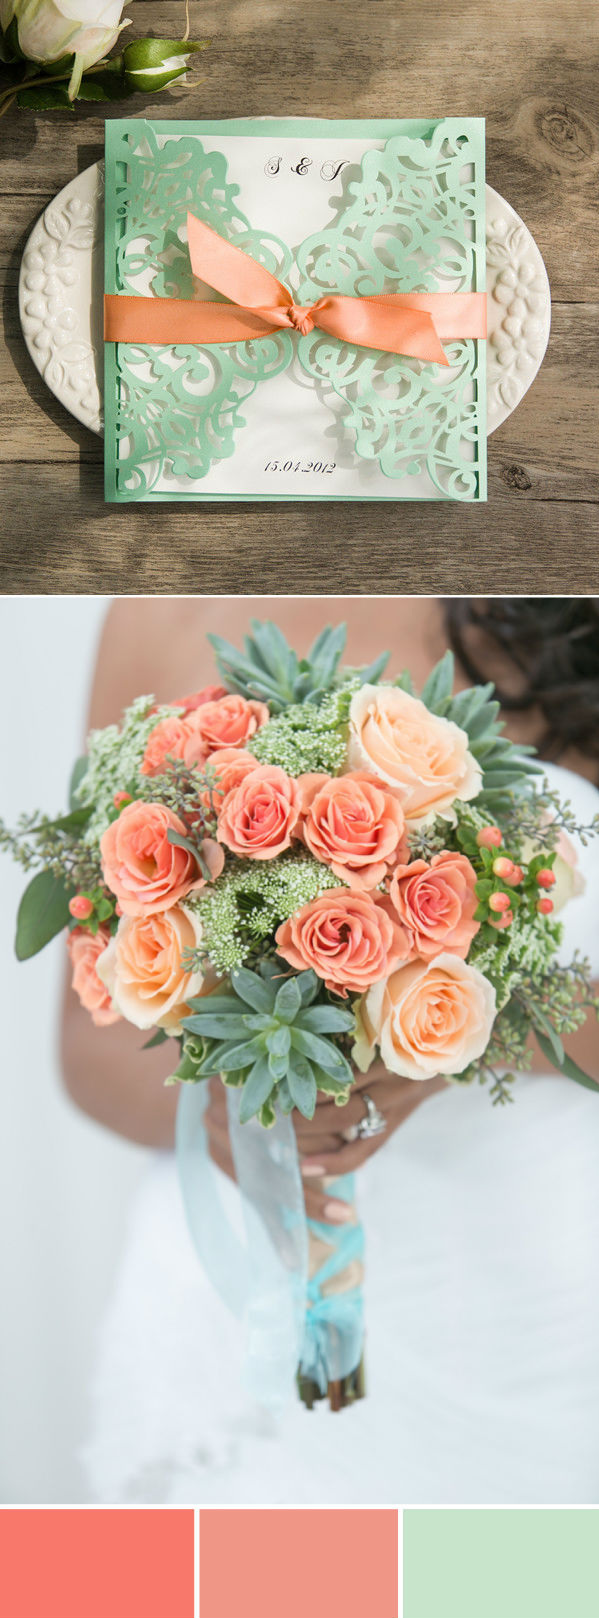 Mint Rustic Wedding Invitations